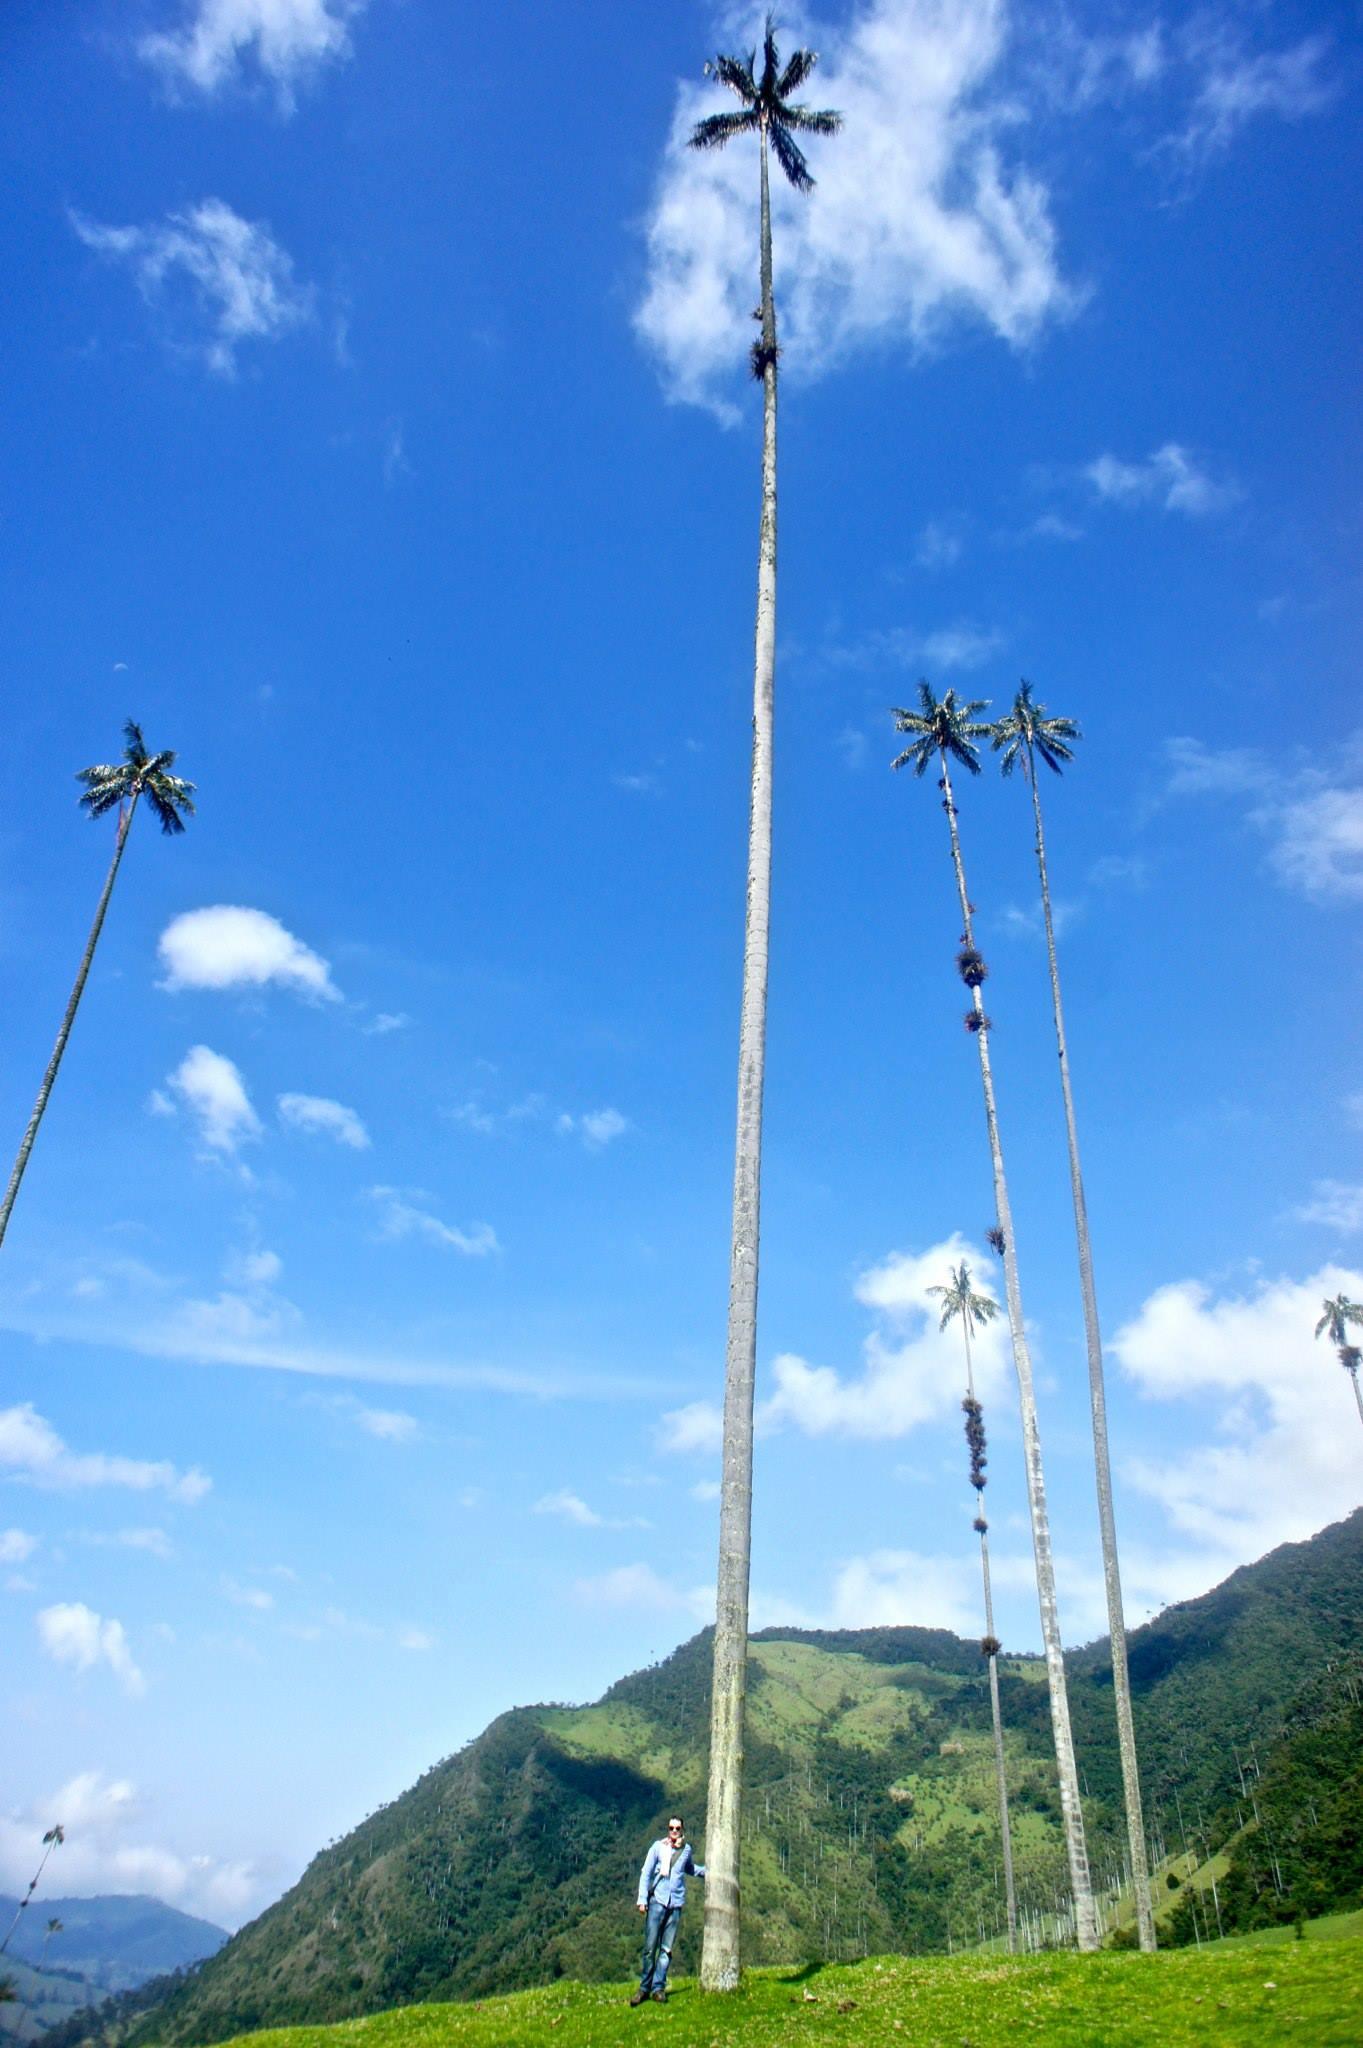 Wax palm tree versus human